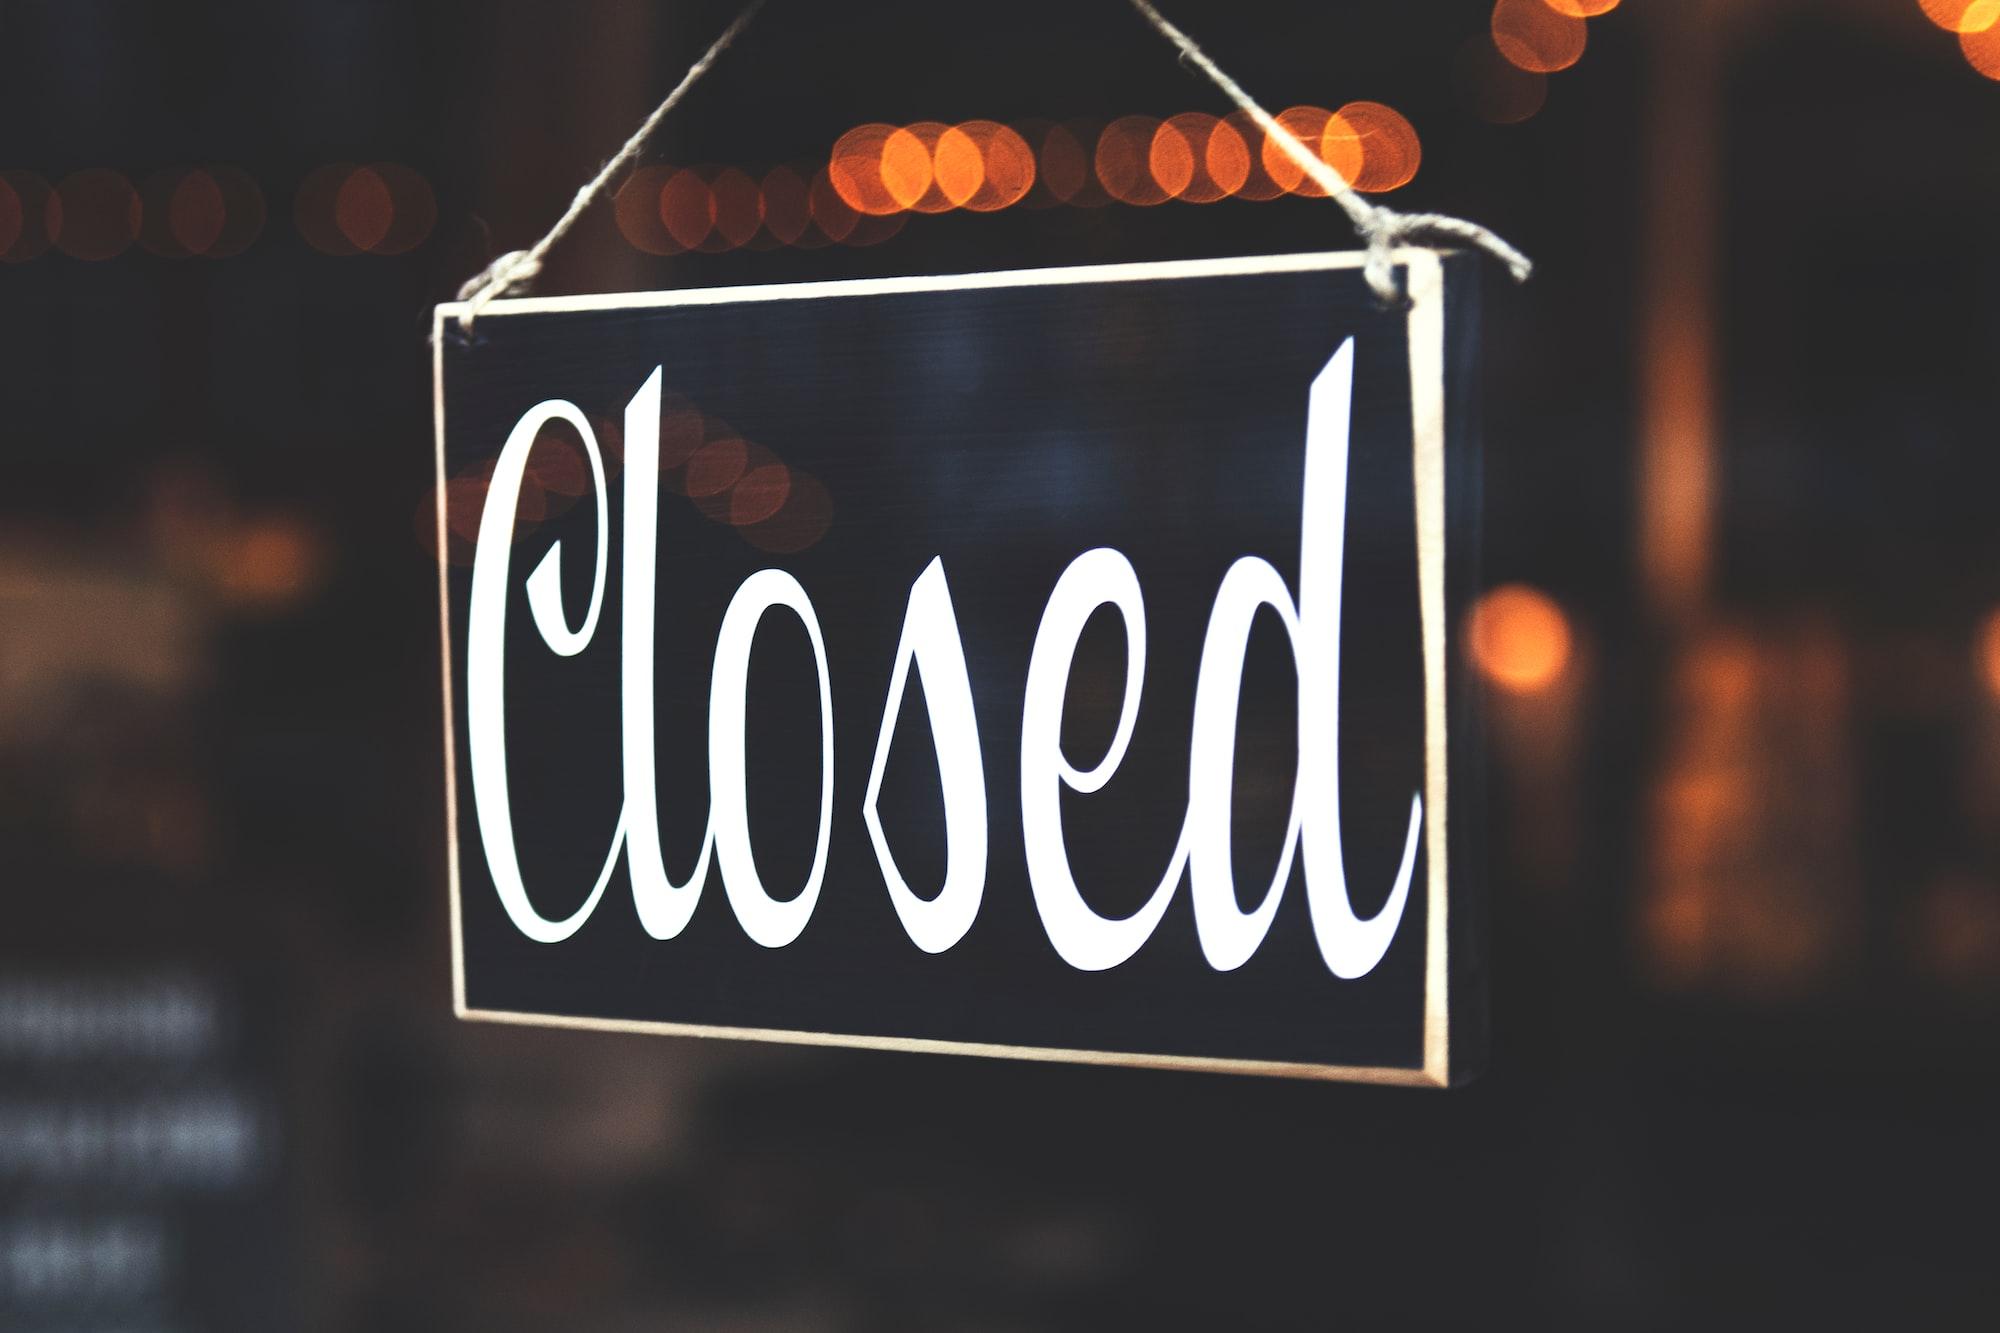 Shutting down an open source project